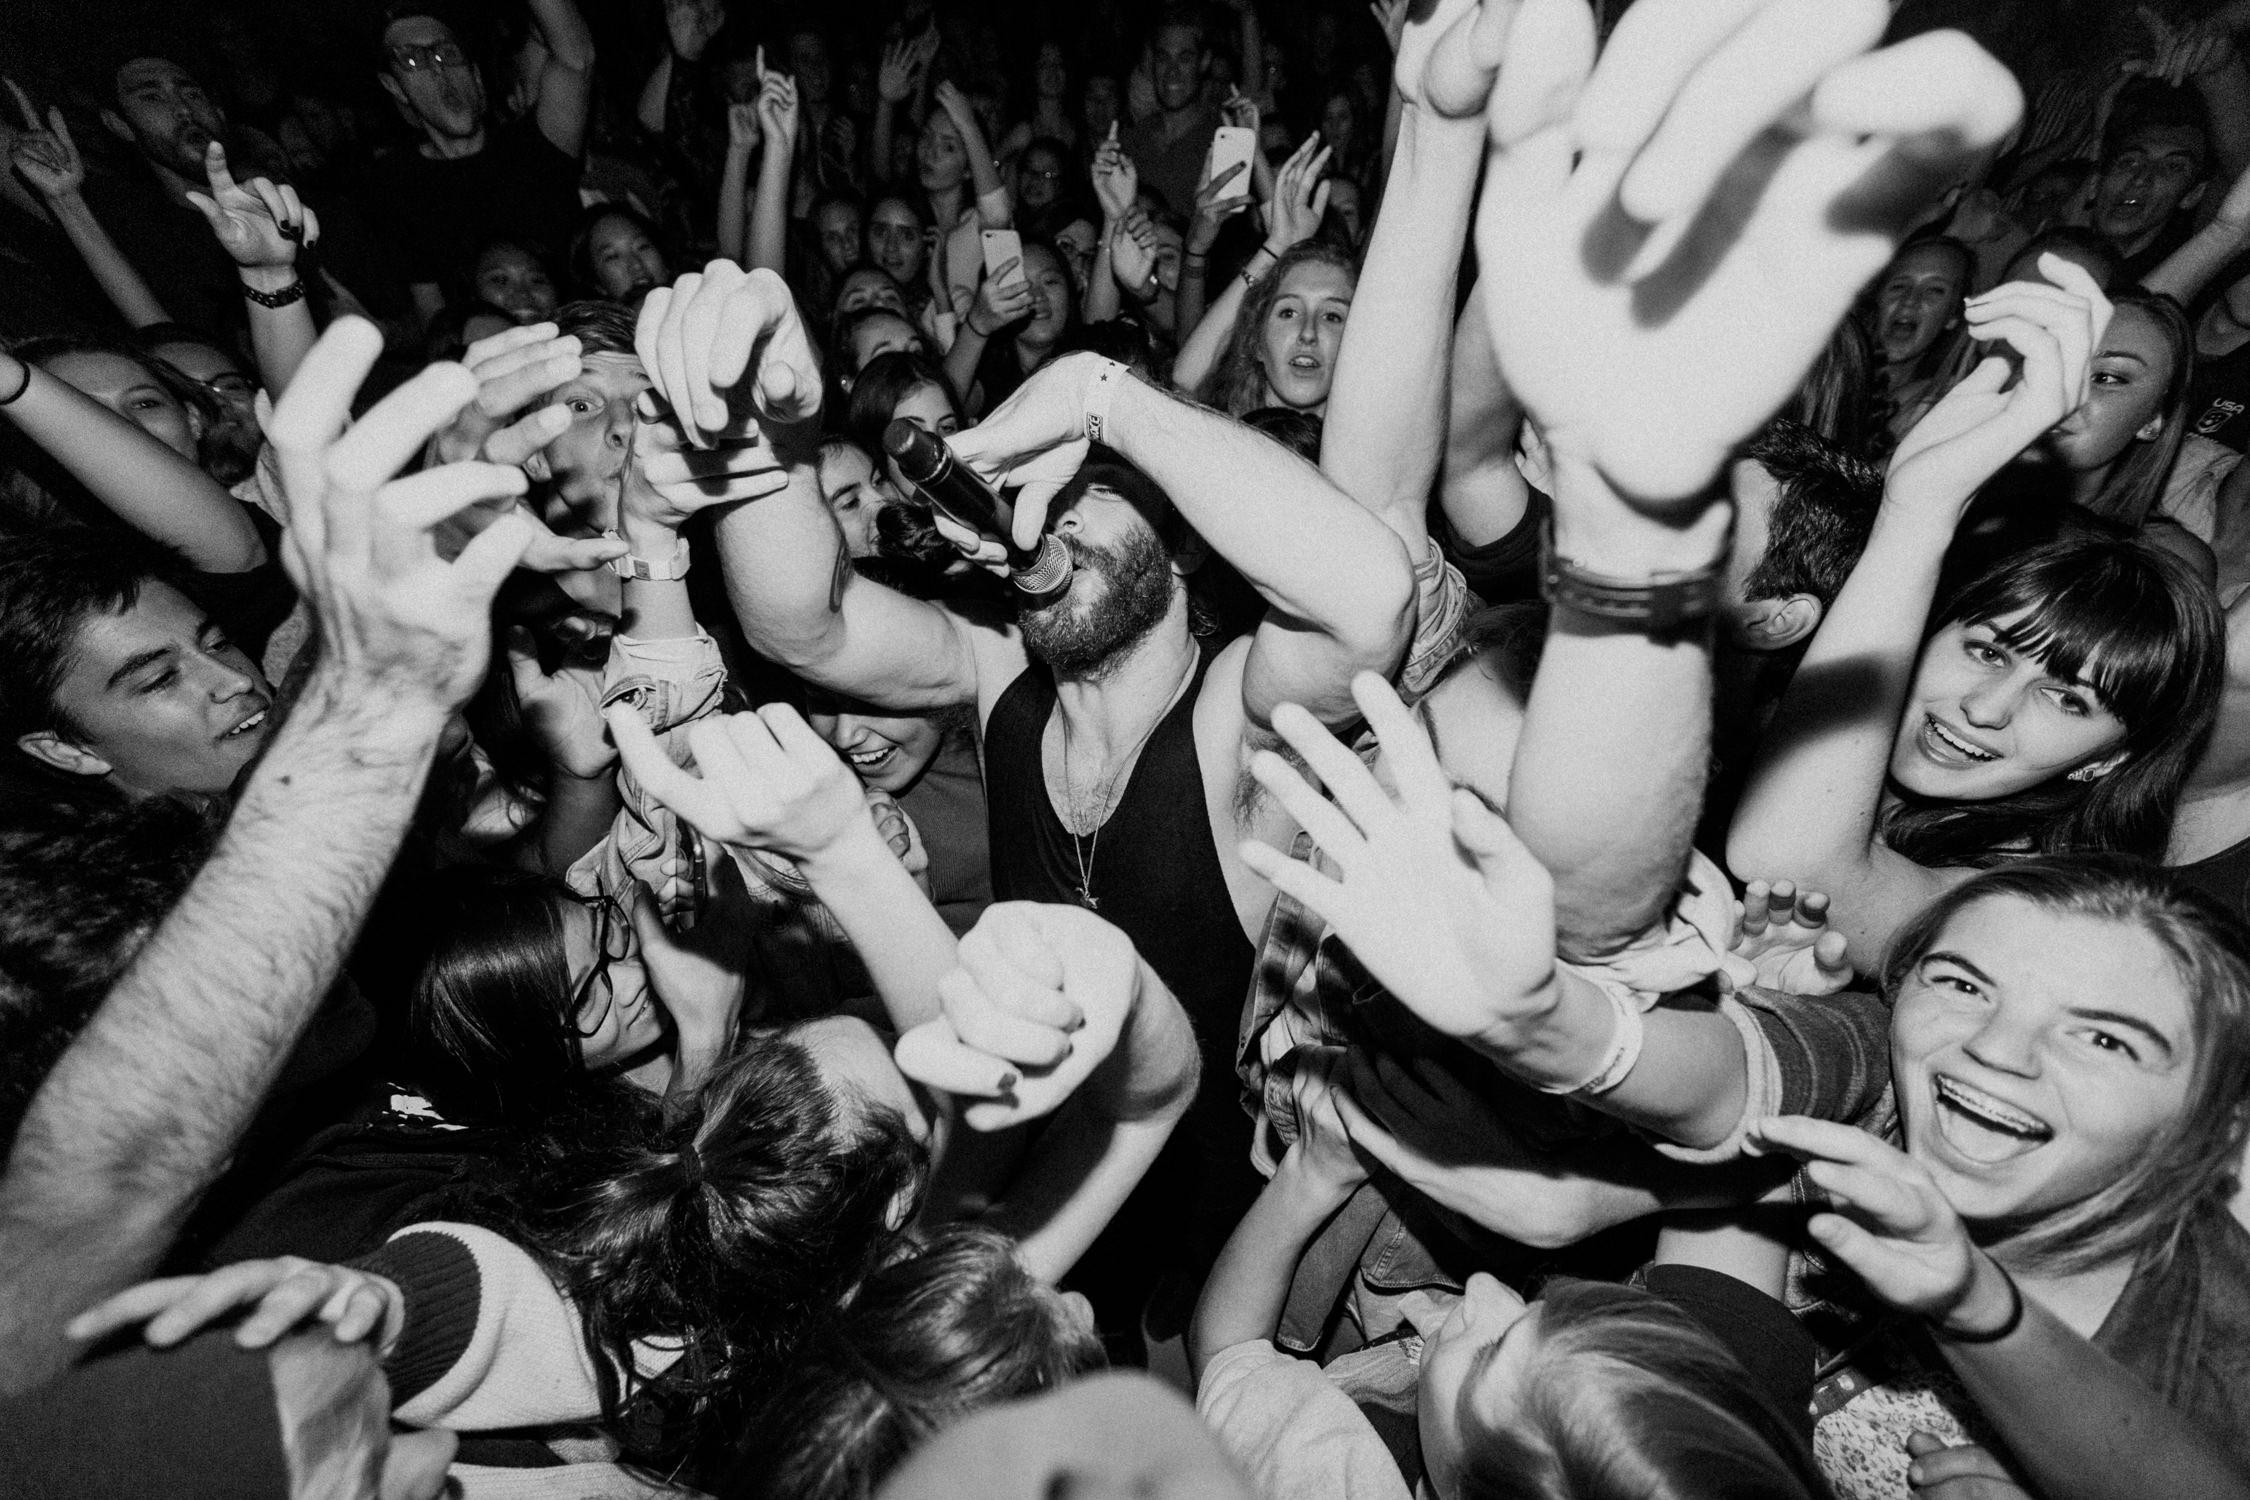 sean-smallpools-singing-dancing-in-crowd-AnnaLeeMedia